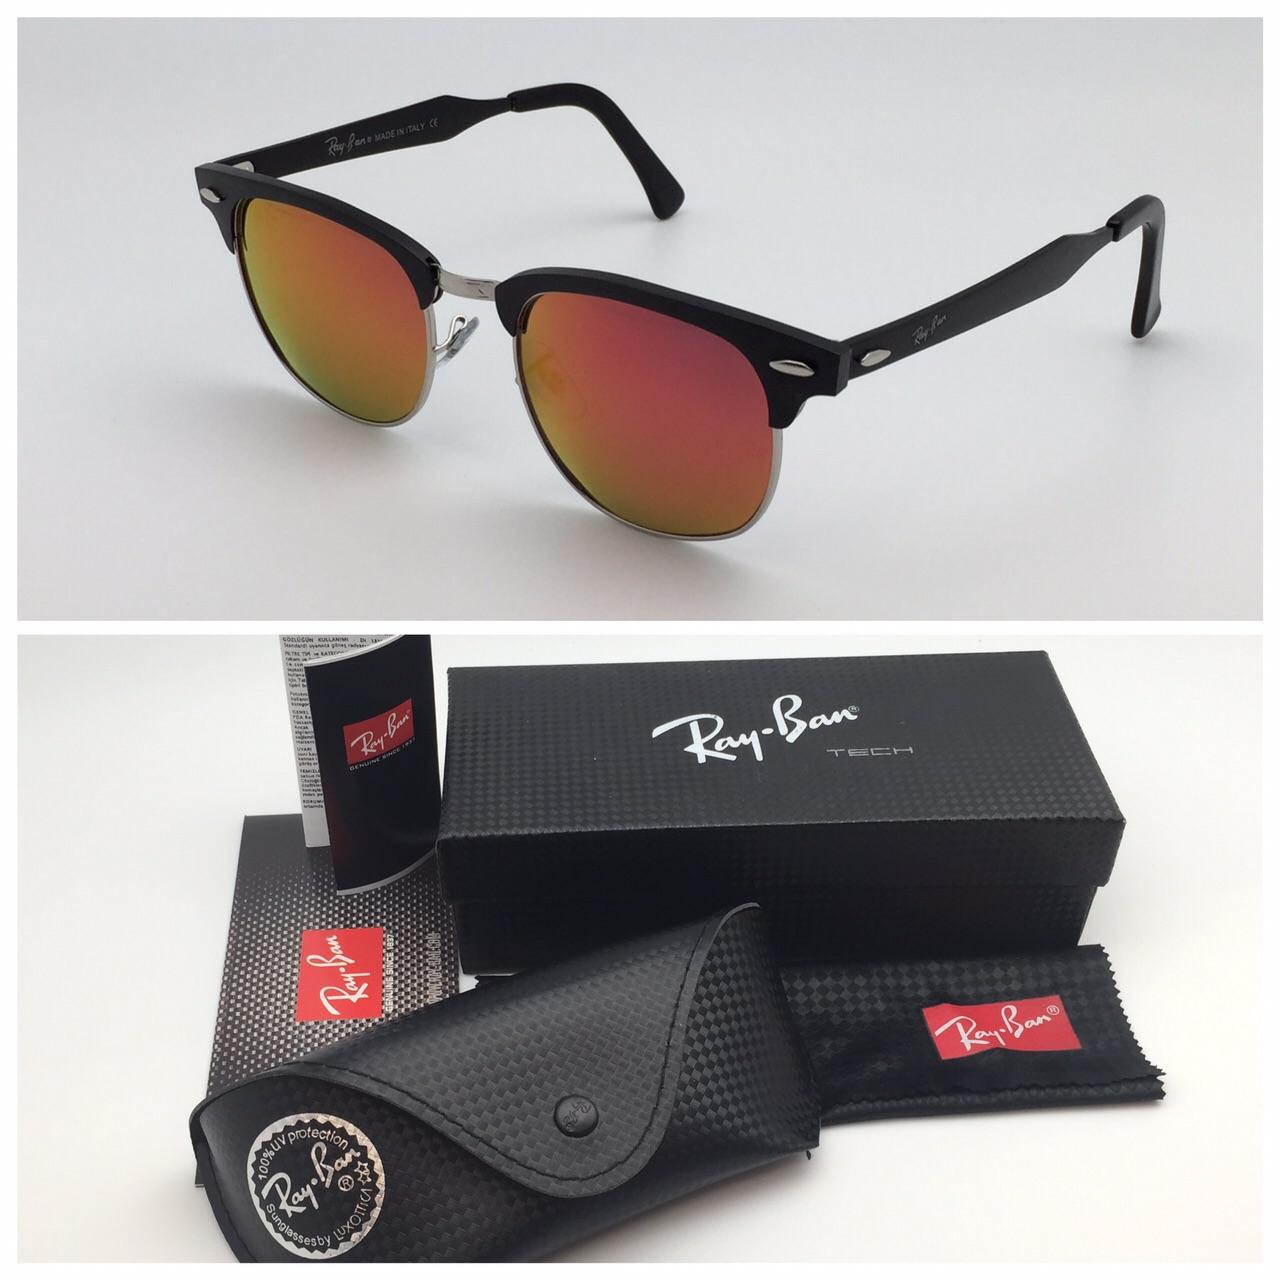 top quality sunglasses ray ban aviator kw super bf24c 86375 1d5e6390fc